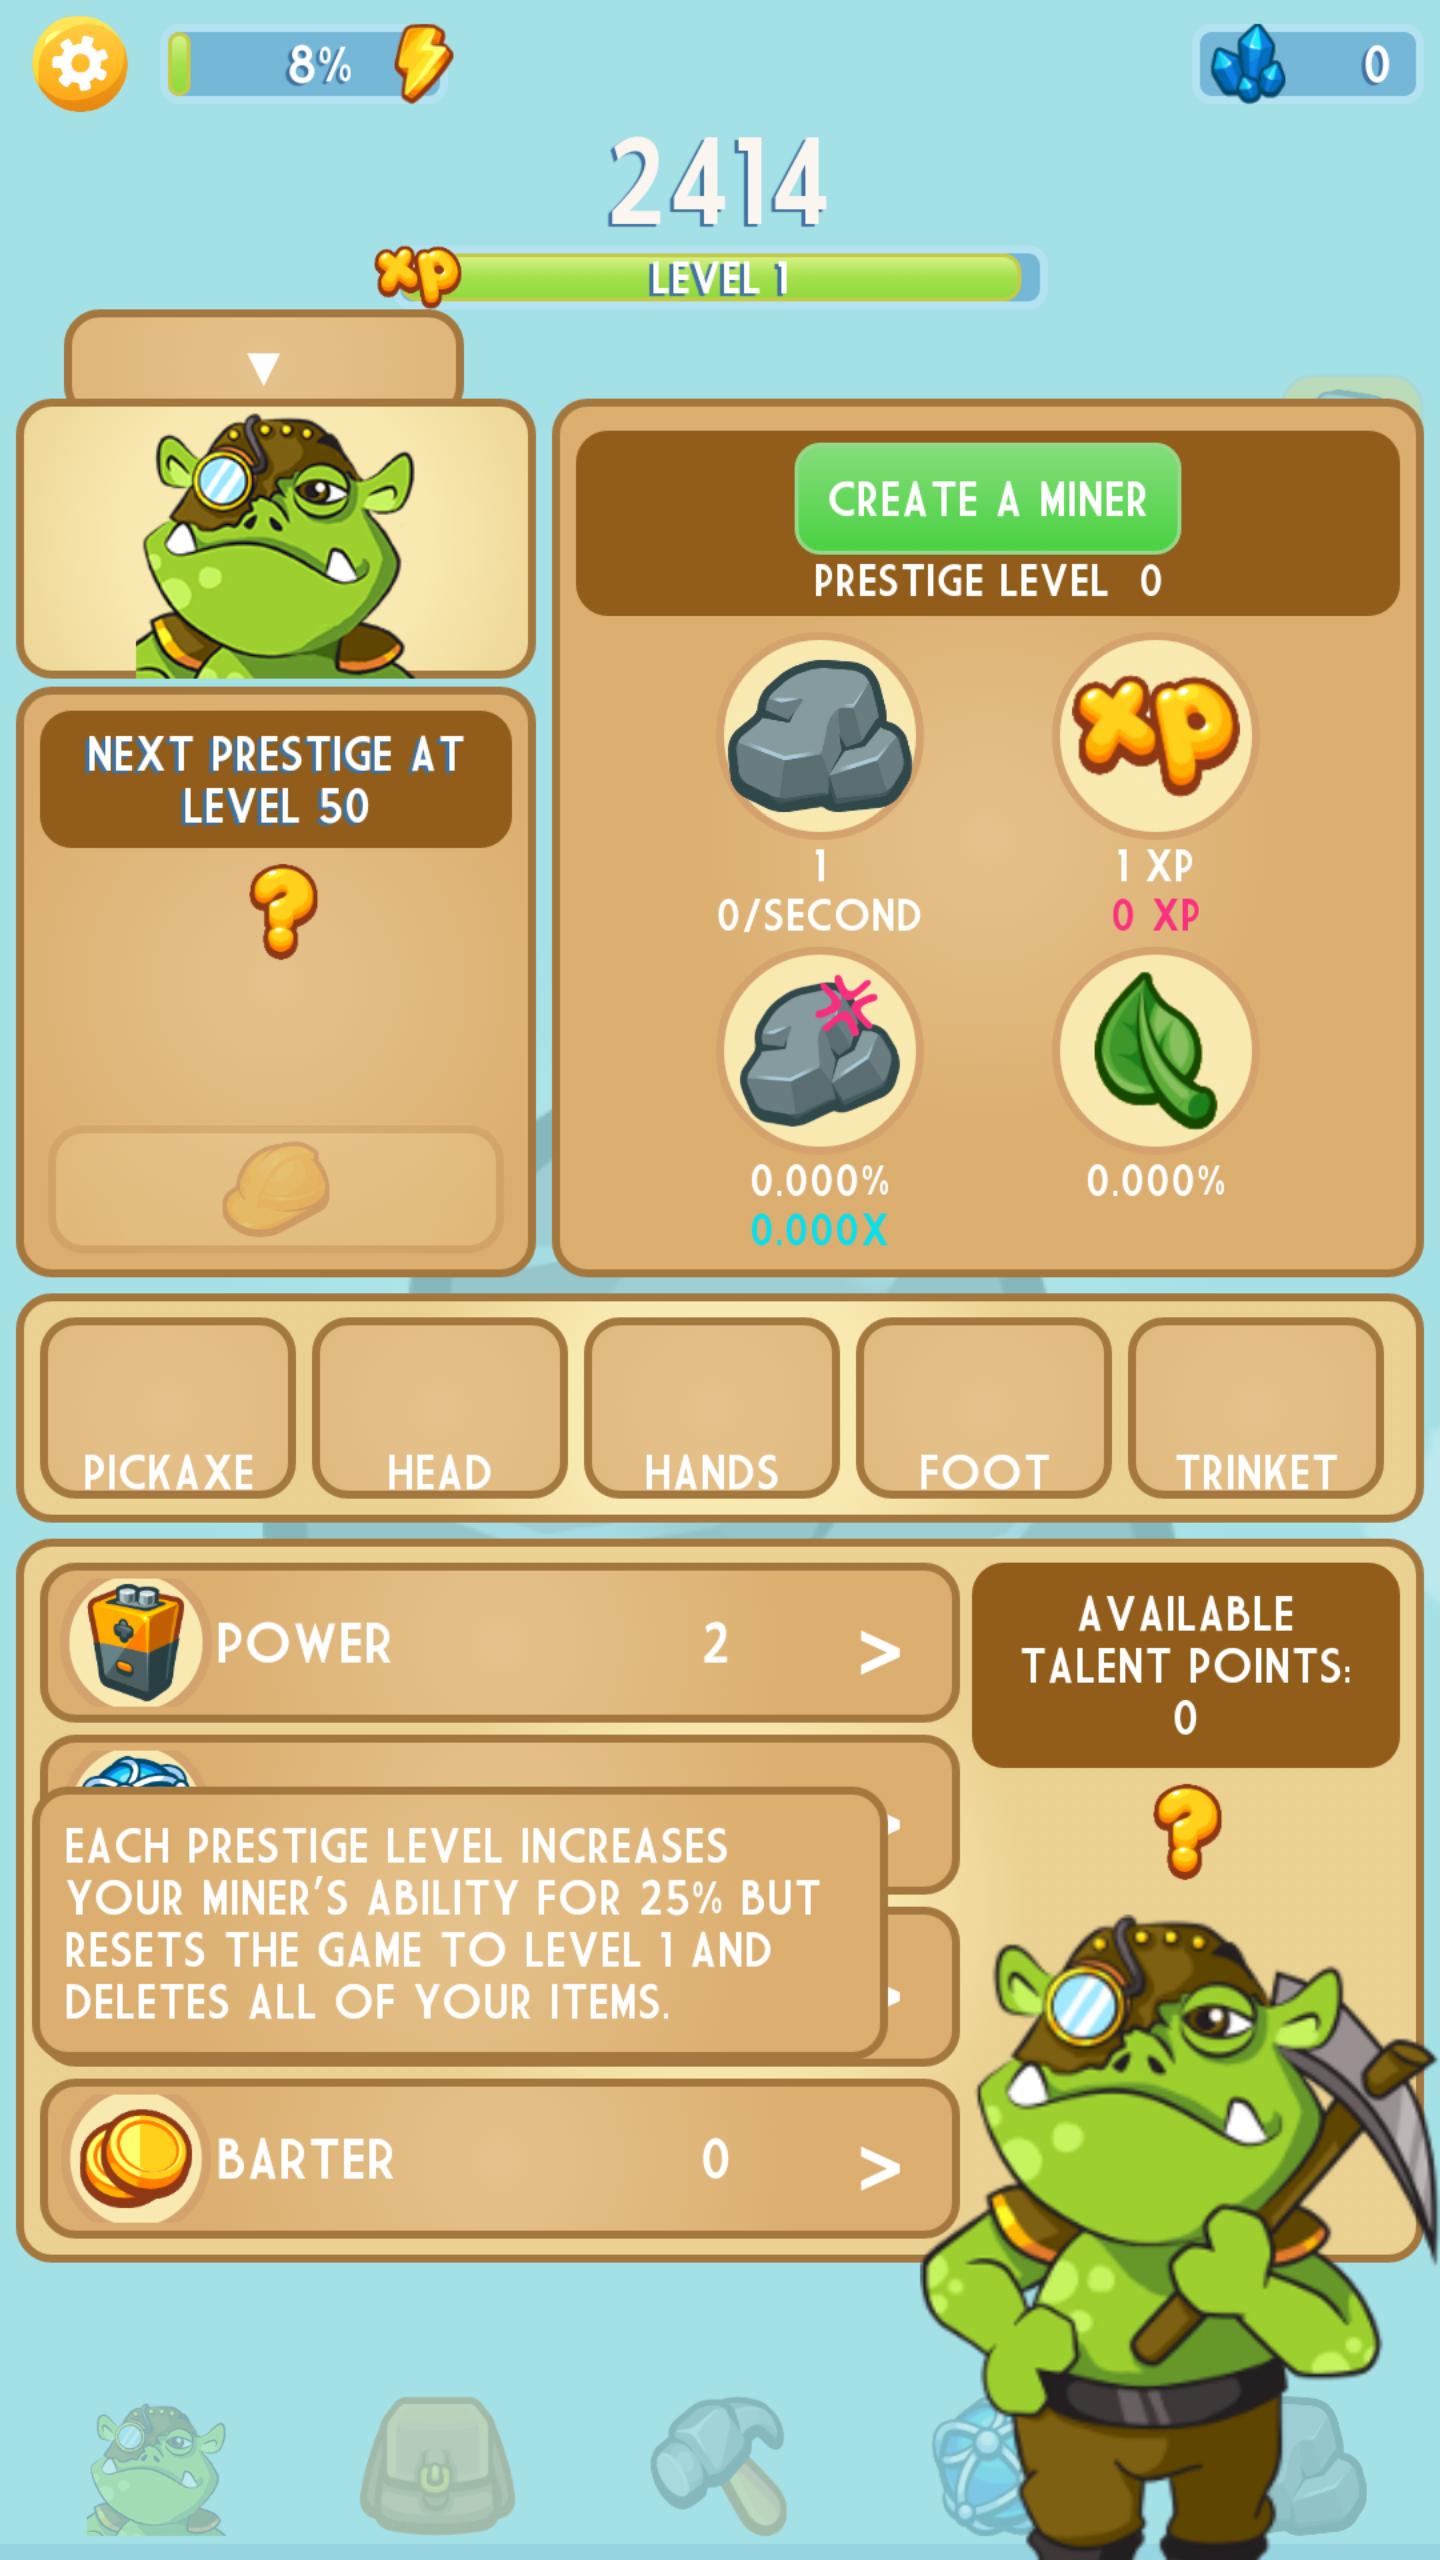 Screenshot Talent Points